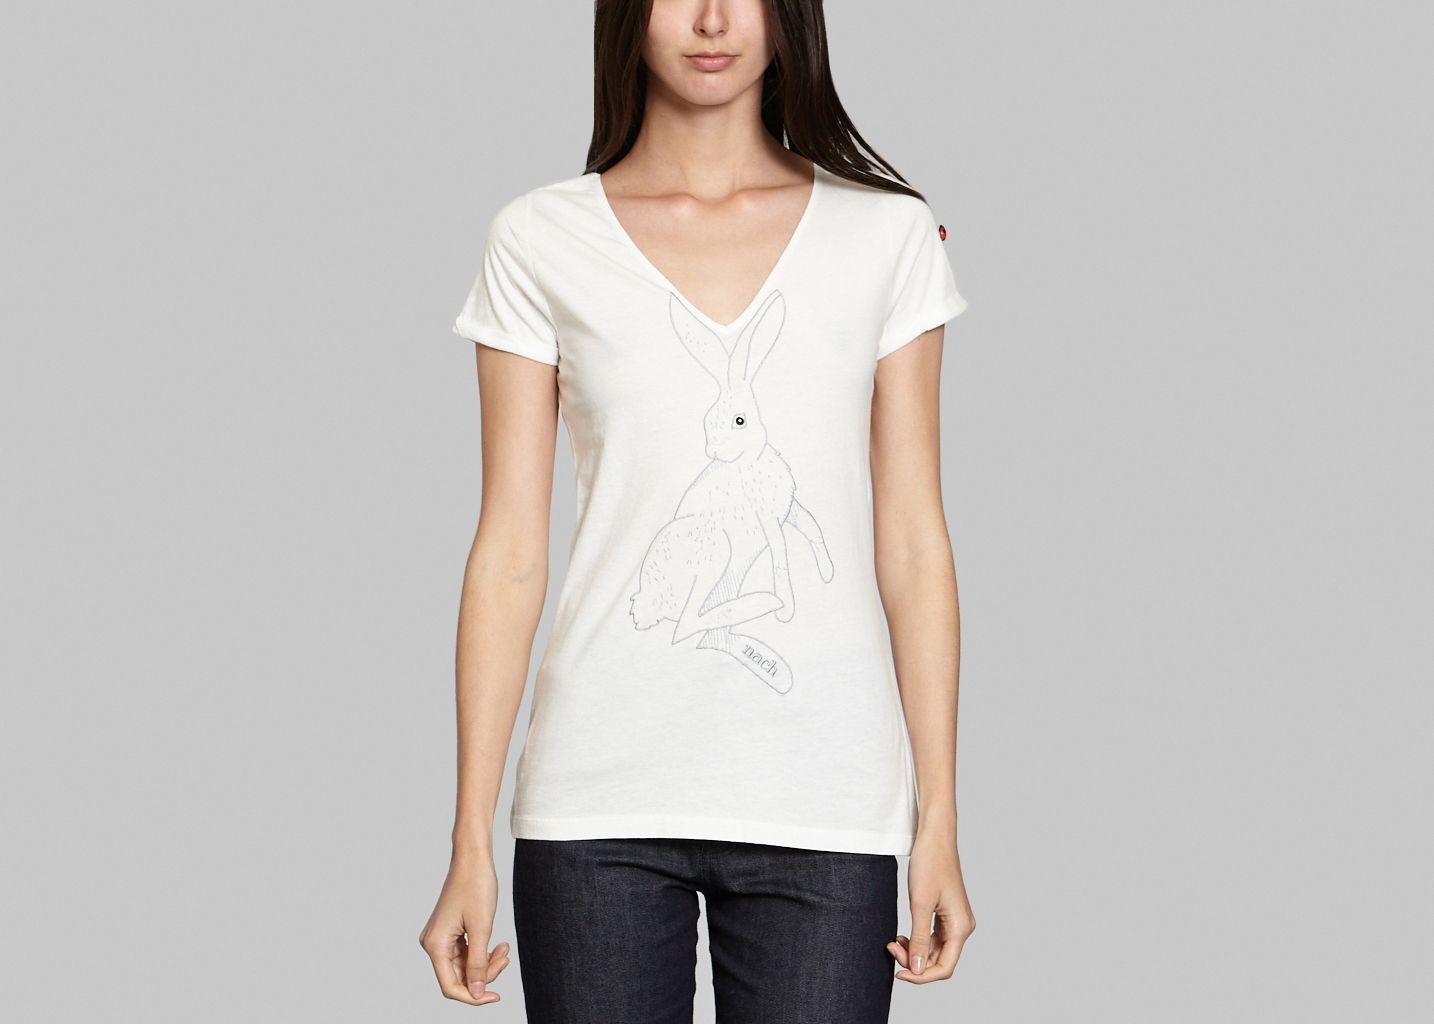 T-Shirt Lapin Brodé - Nach Bijoux